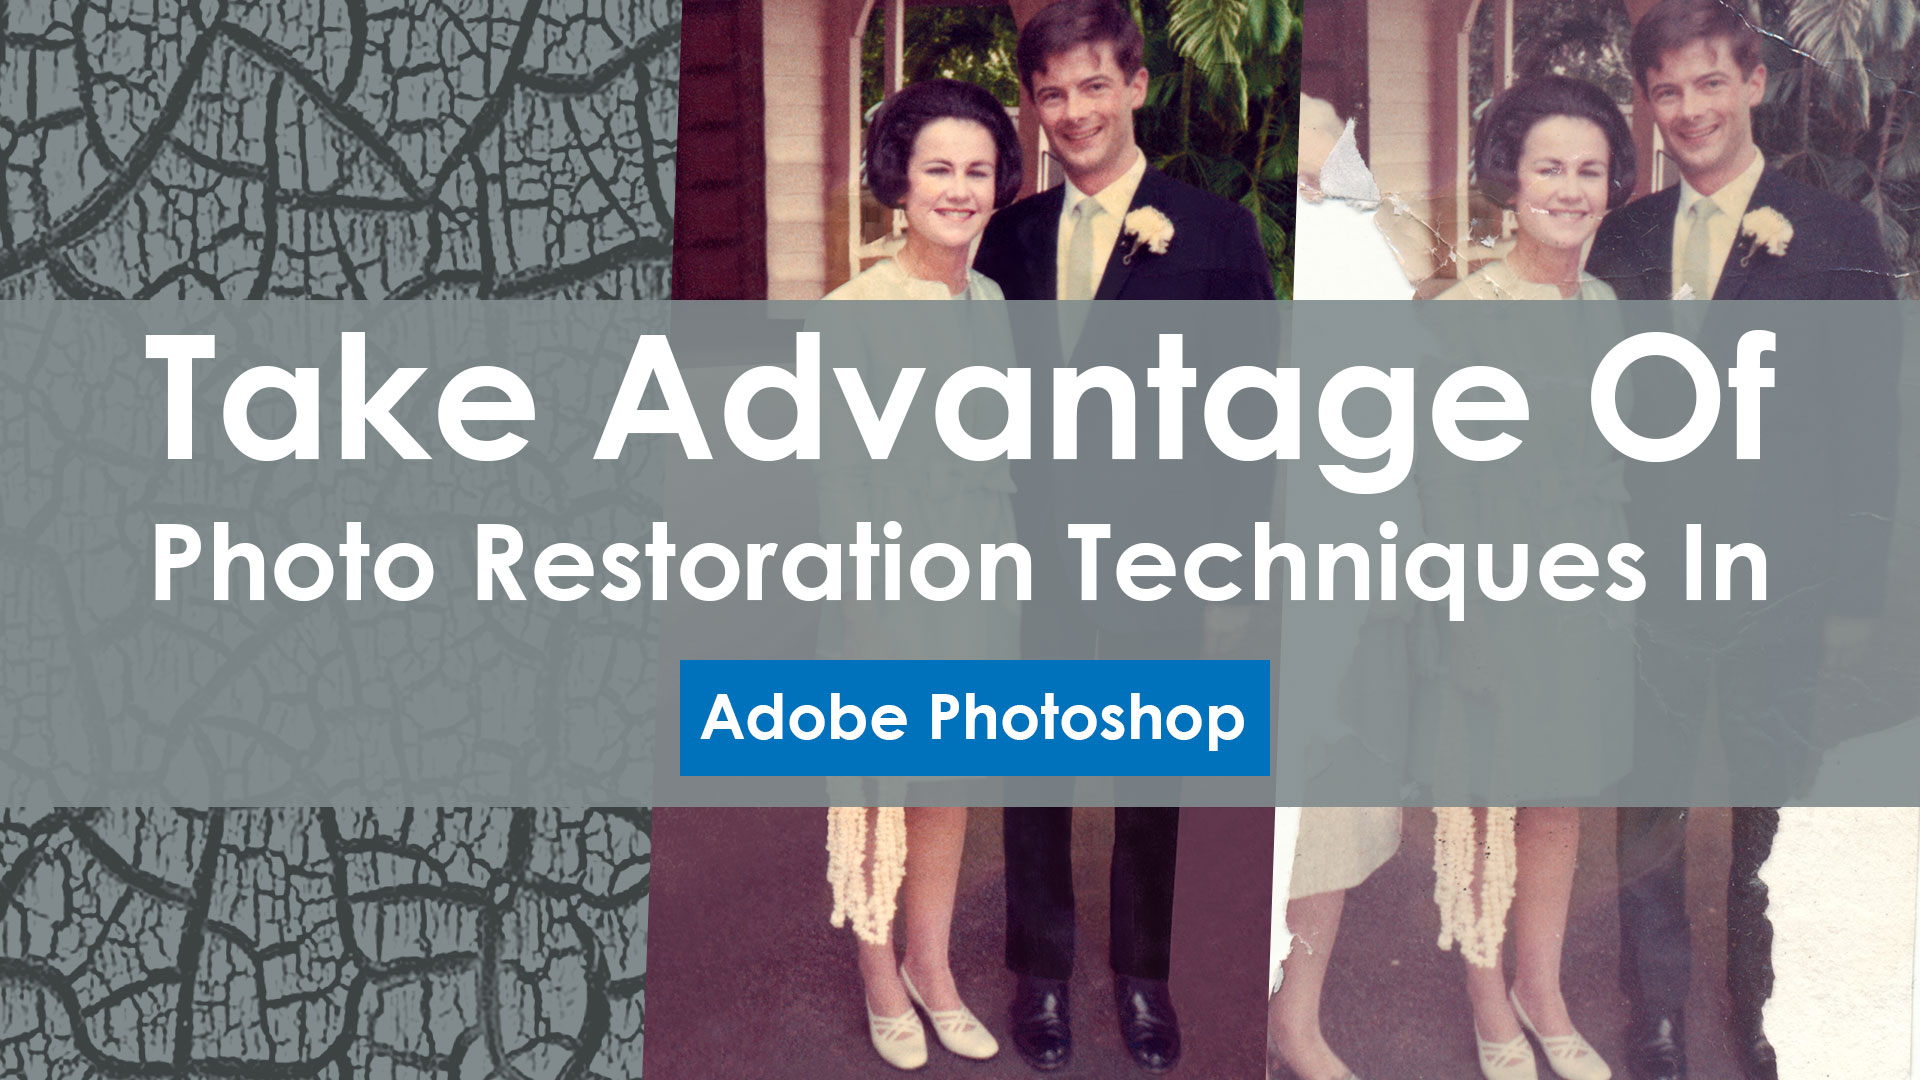 Take-Advantage-Of-Photo-Restoration-Techniques-In-Photoshop